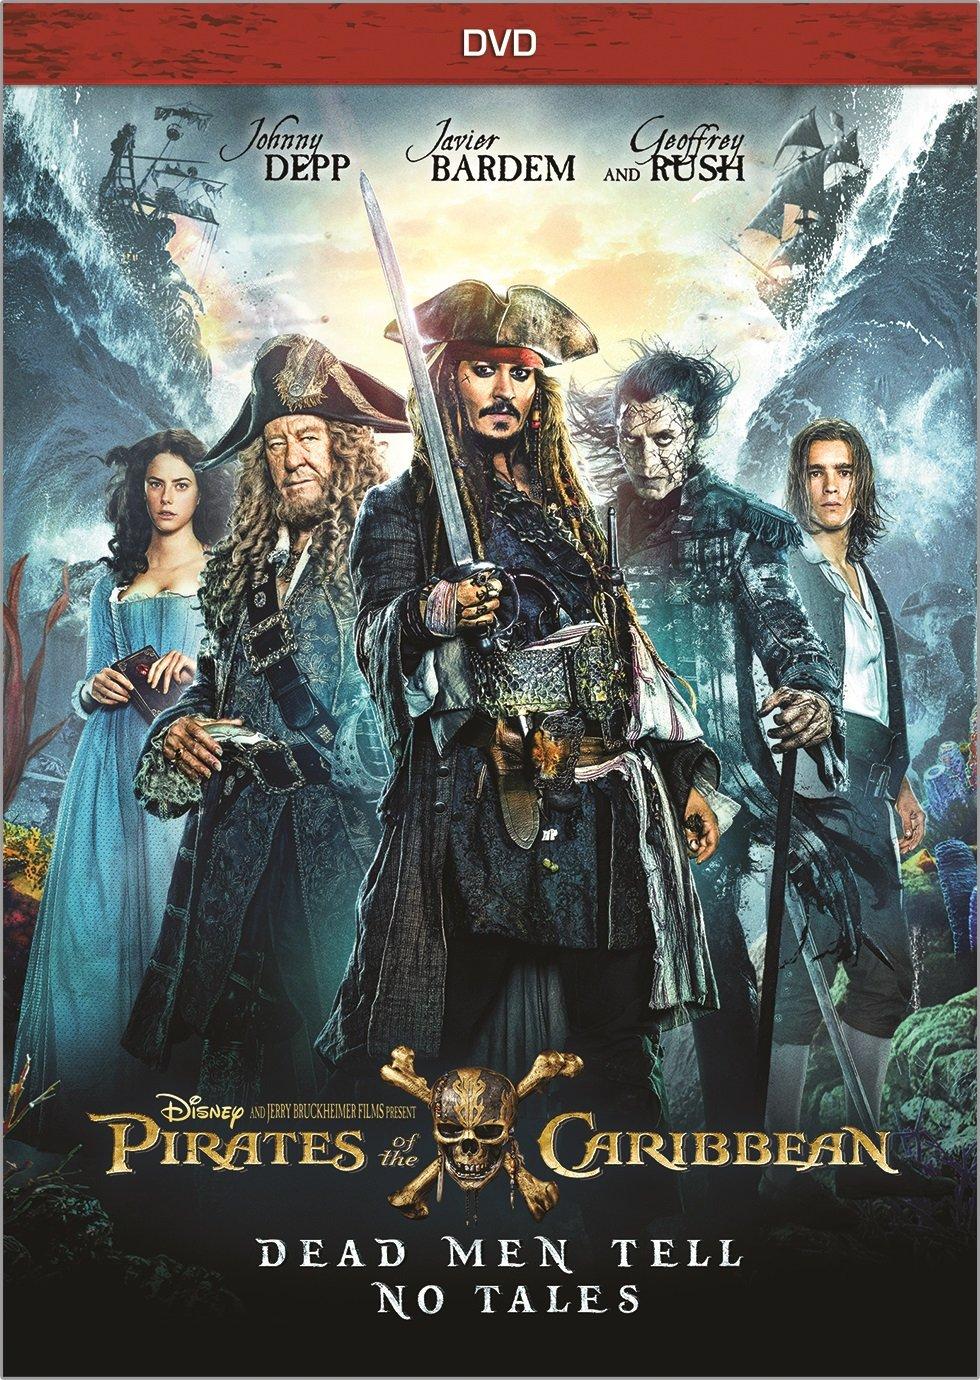 Pirates Of The Caribbean film 5 - Dead Men Tell No Tales / Salazar's Revenge